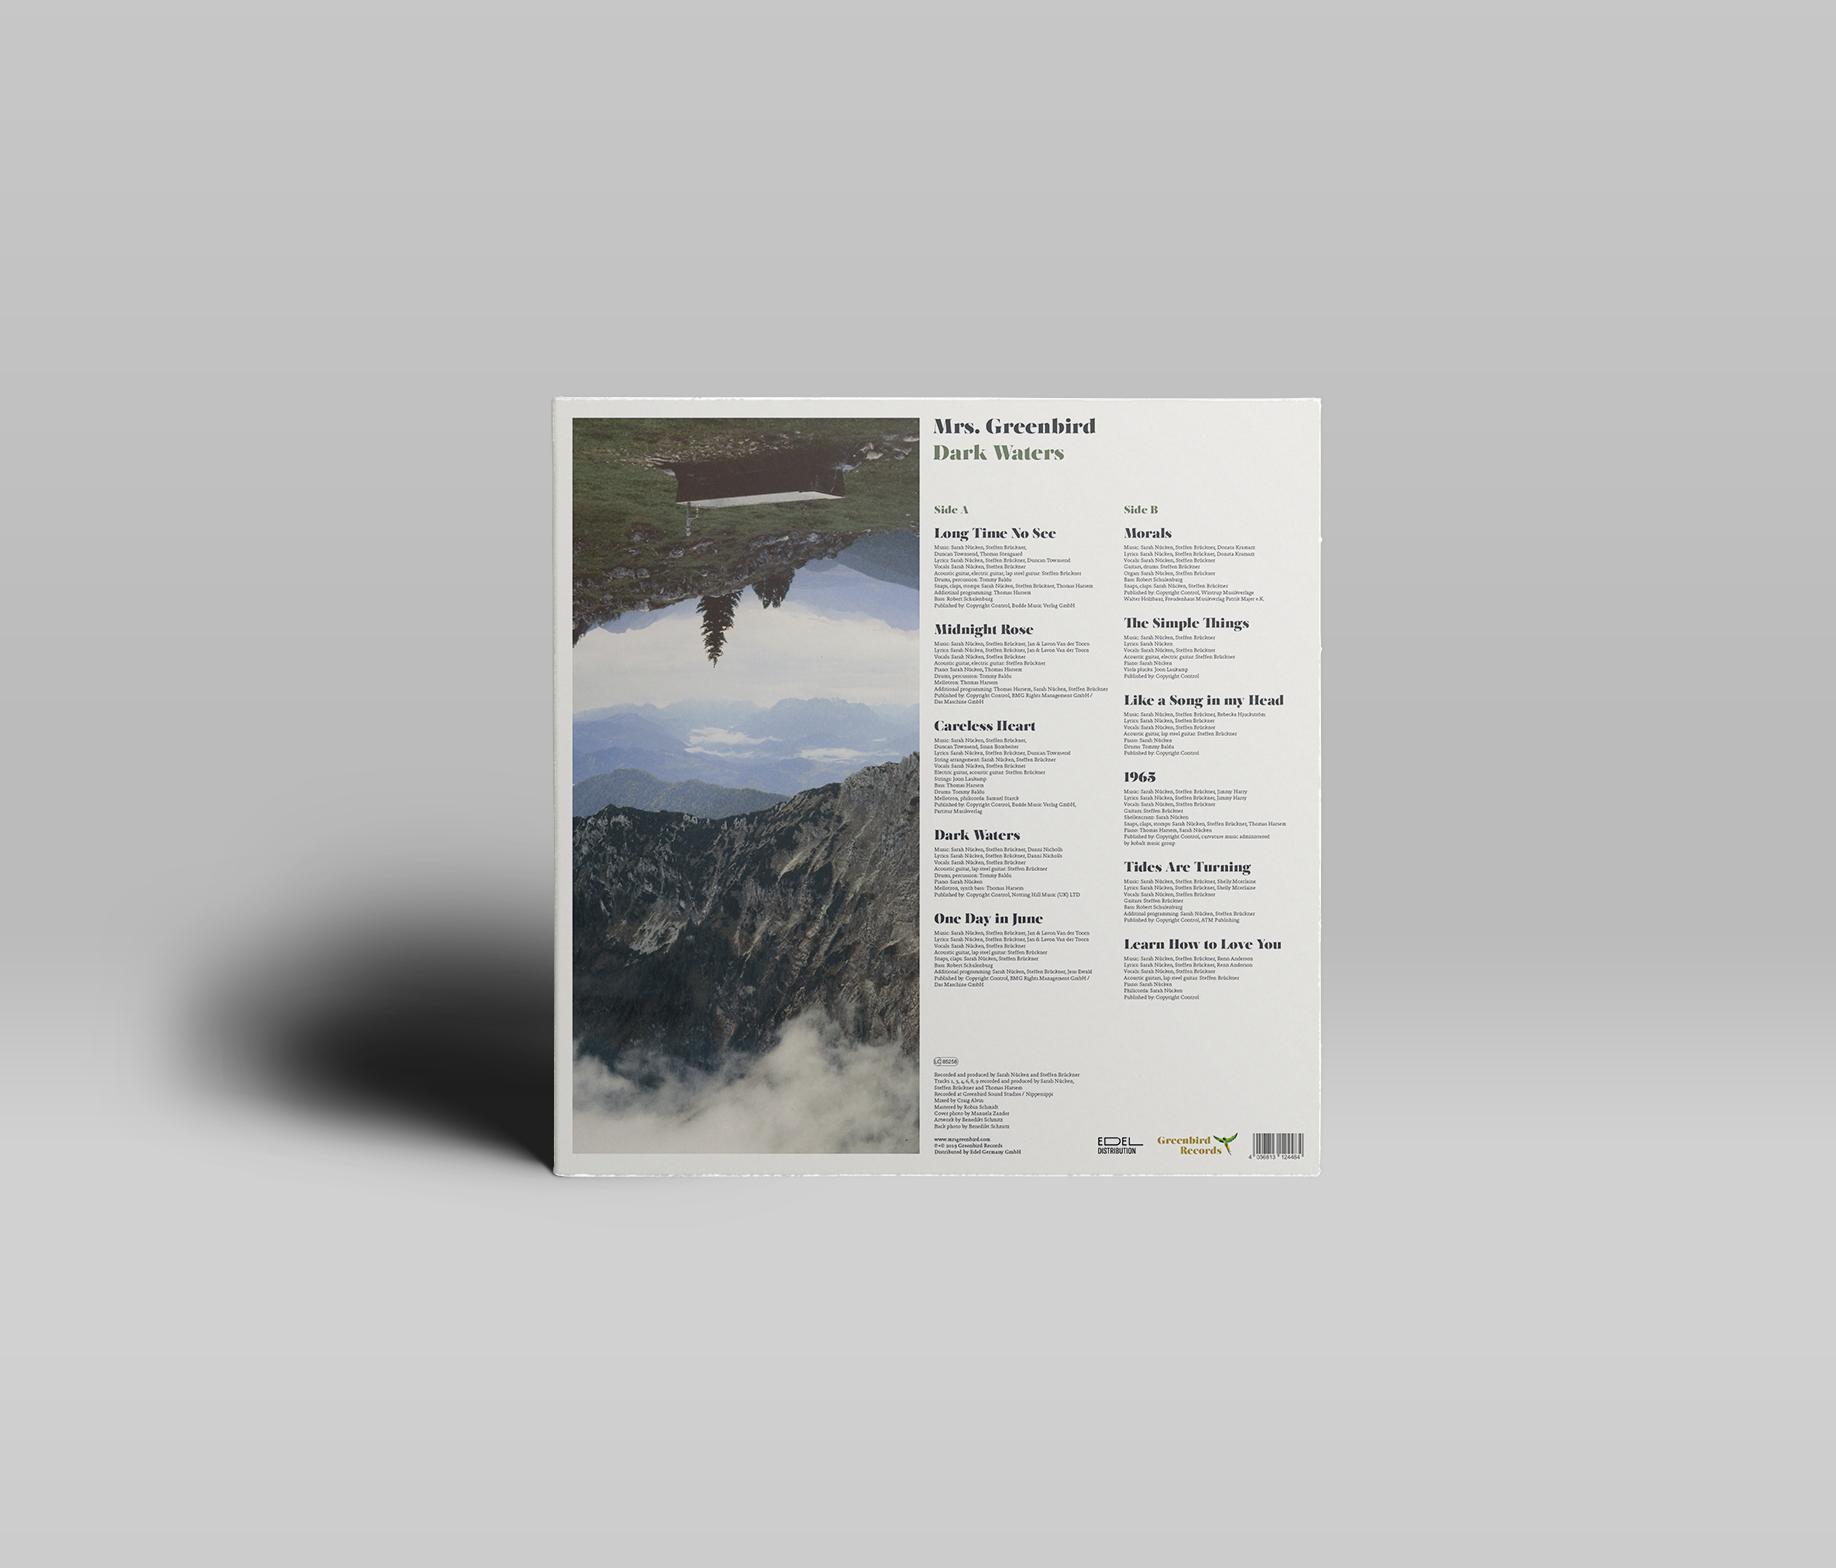 MRSG_Vinyl-Record-and-Cover-Presentation-Mock-up_Back.jpg